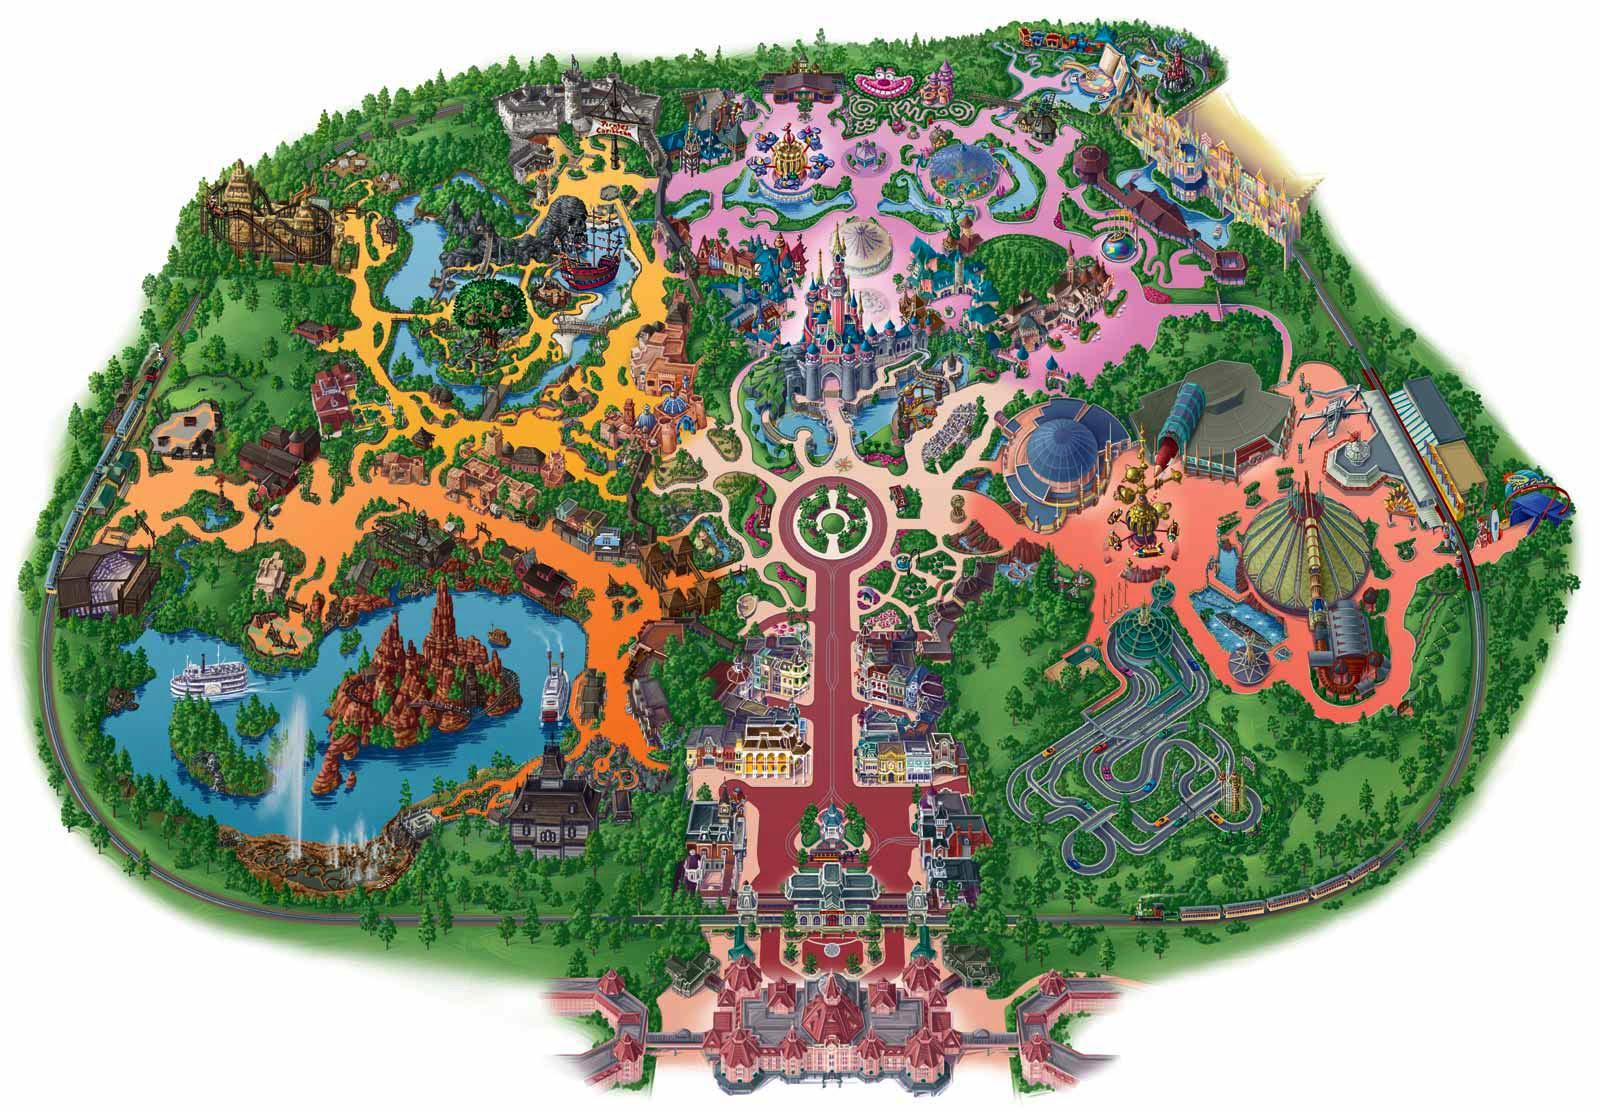 Printable Magic Kingdom Map 2015 2016 - Disney World Magic Kingdom ...